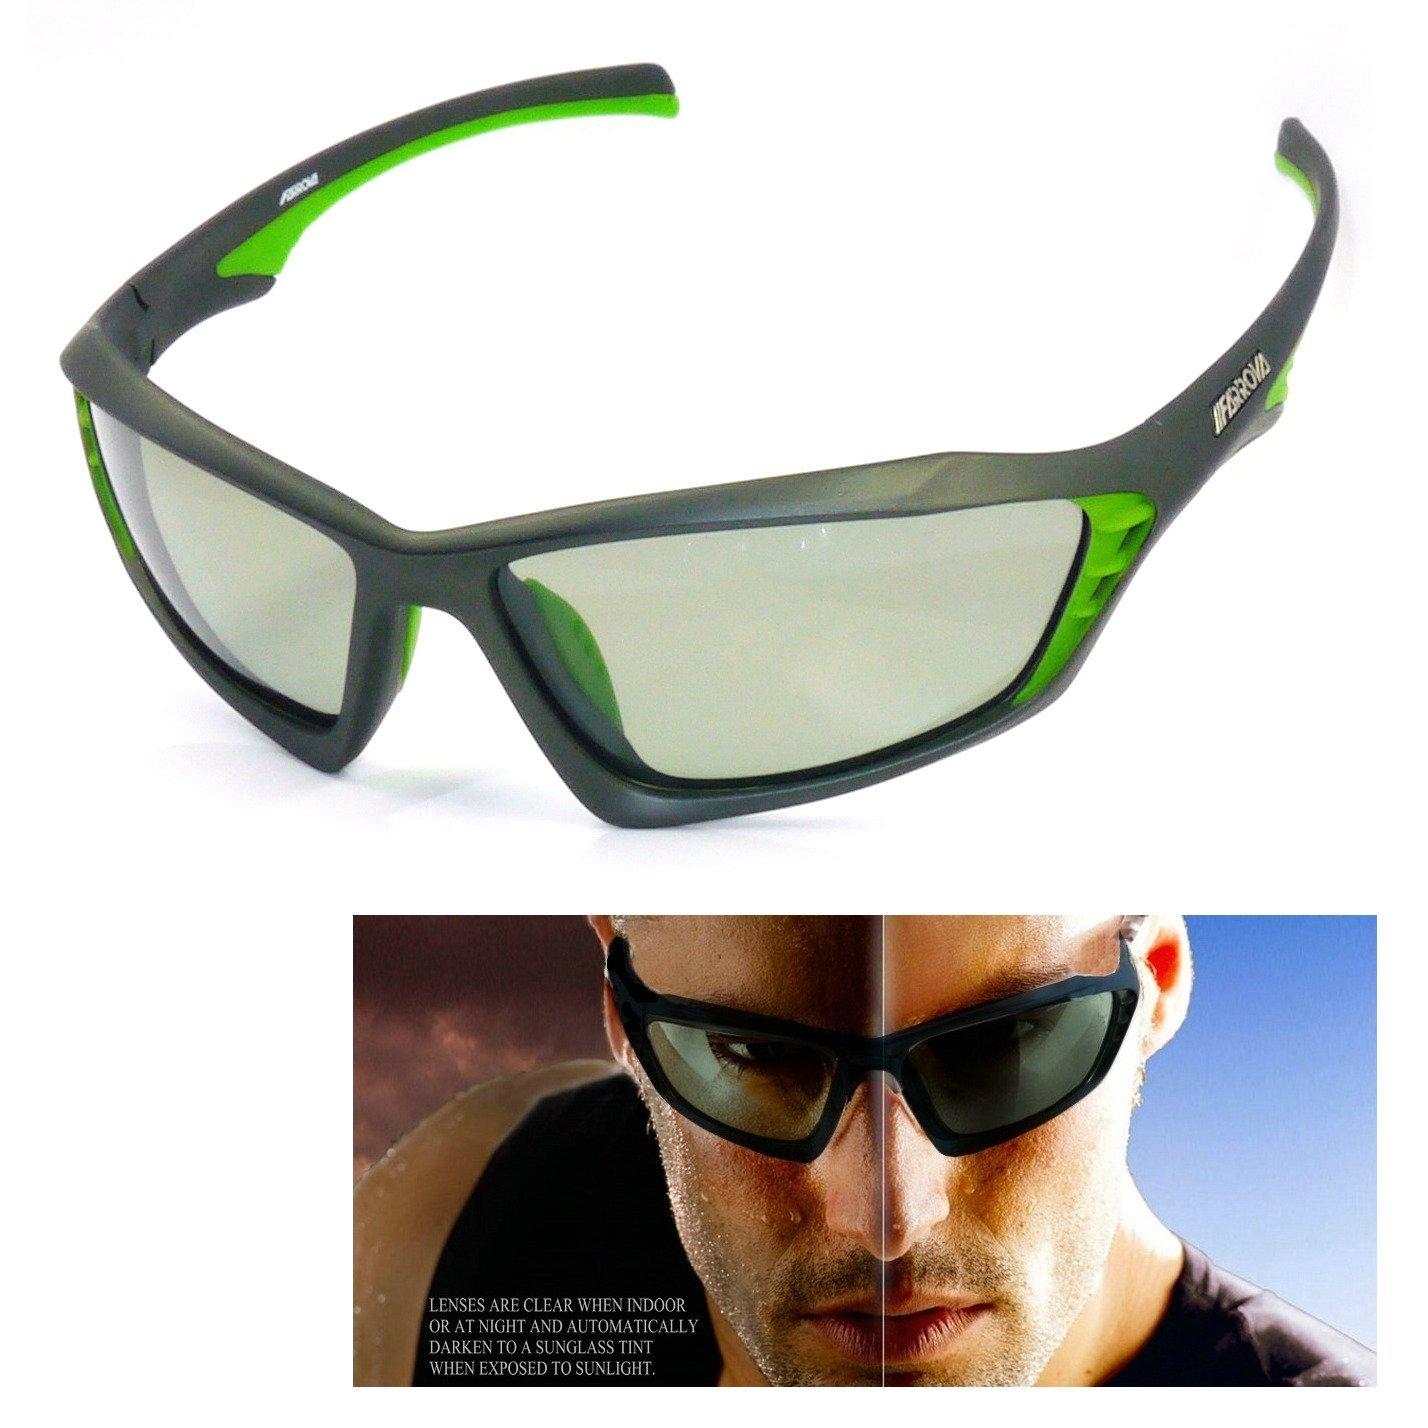 5c59b57b543c Get Quotations · FARROVA - KD015 POLARIZED Sports Sunglasses with Smart  Photochromic Lenses (Black Grey Lenses